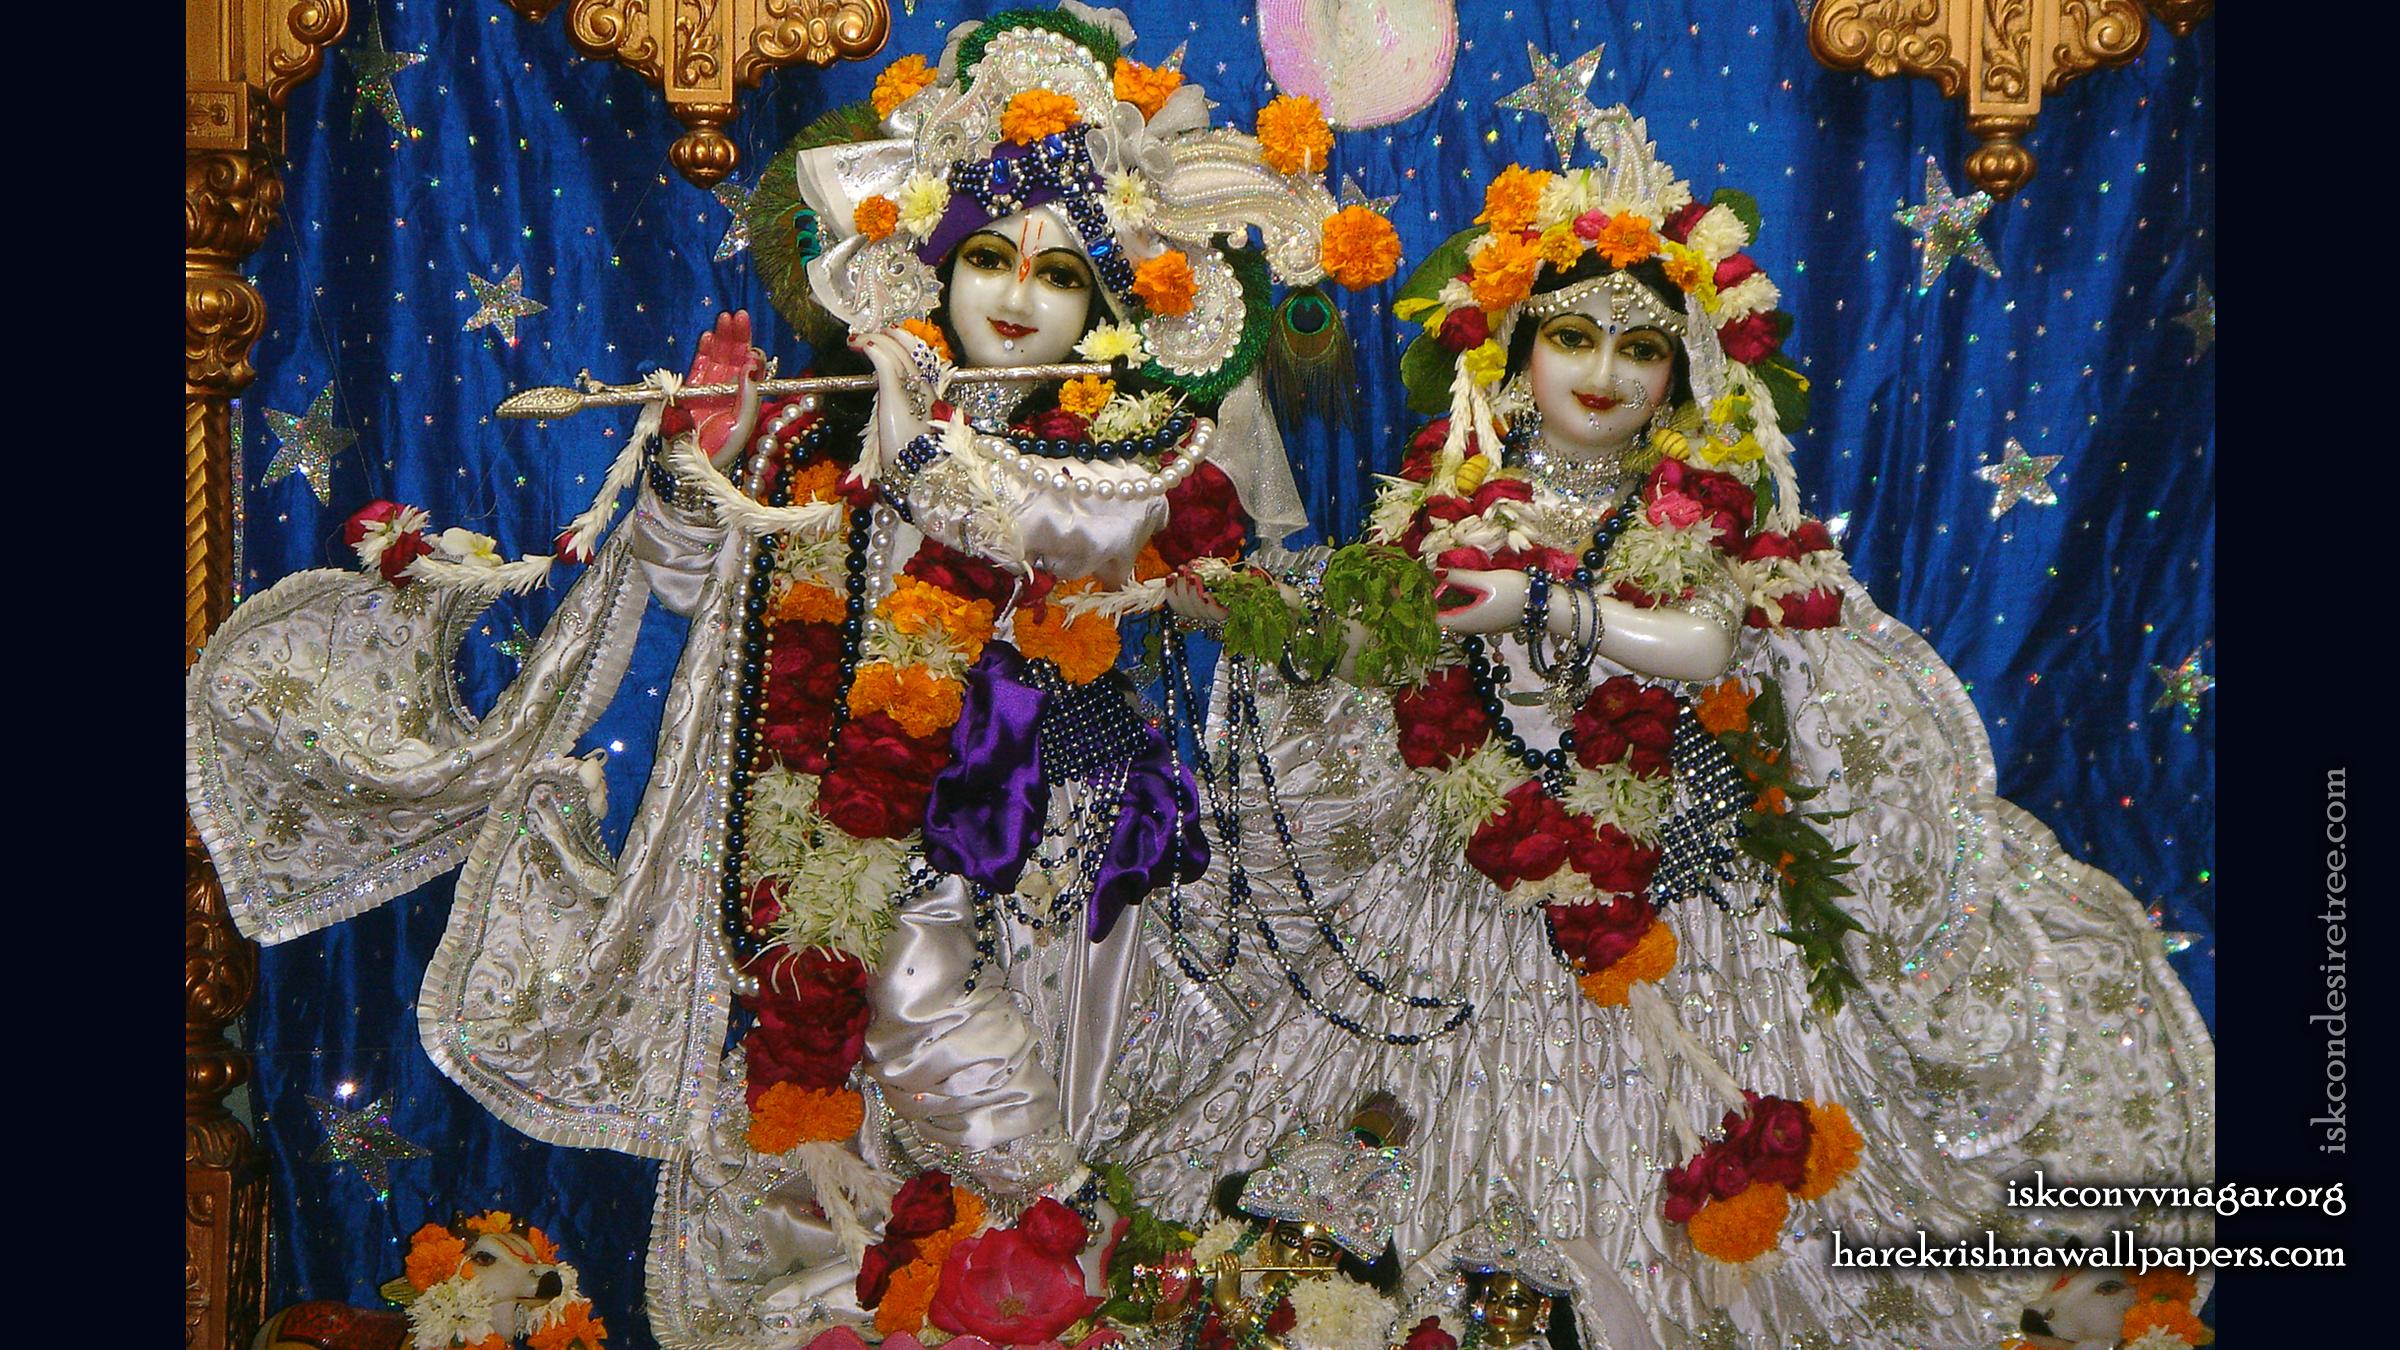 Sri Sri Radha Giridhari Wallpaper (020) Size 2400x1350 Download